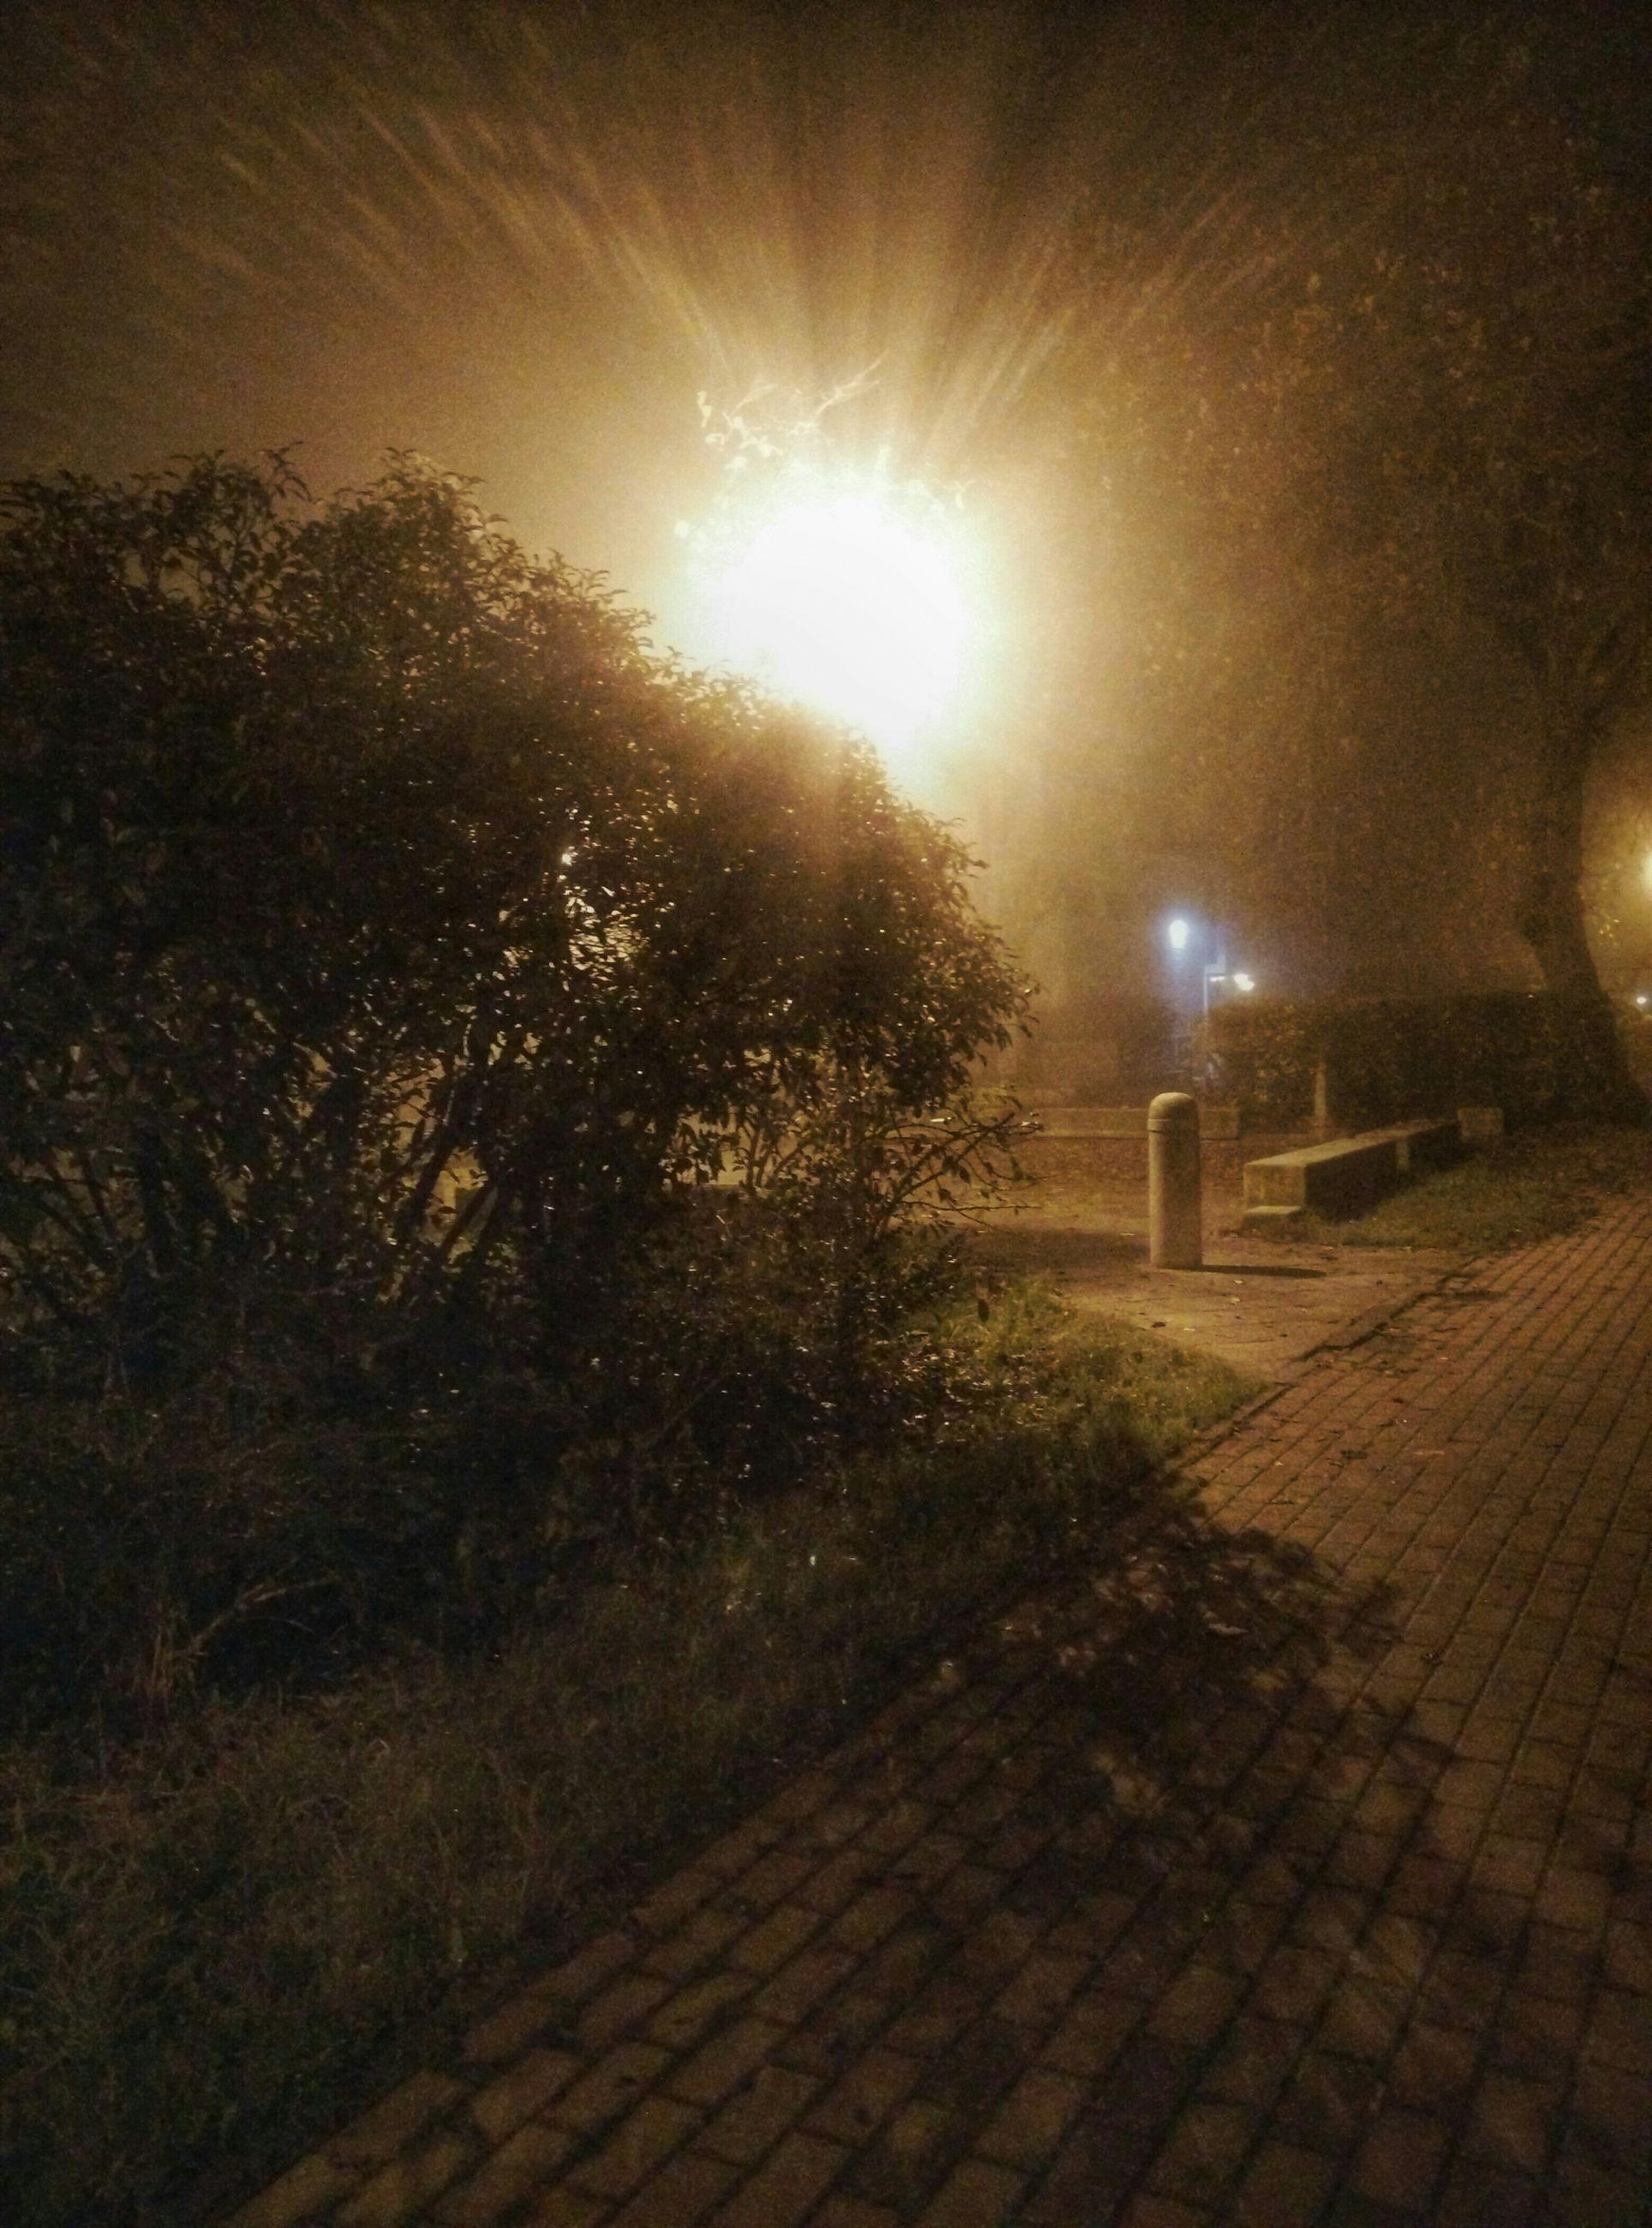 night, tree, illuminated, street light, the way forward, footpath, street, lighting equipment, grass, road, outdoors, growth, sunlight, nature, tranquility, no people, lens flare, empty, cobblestone, plant